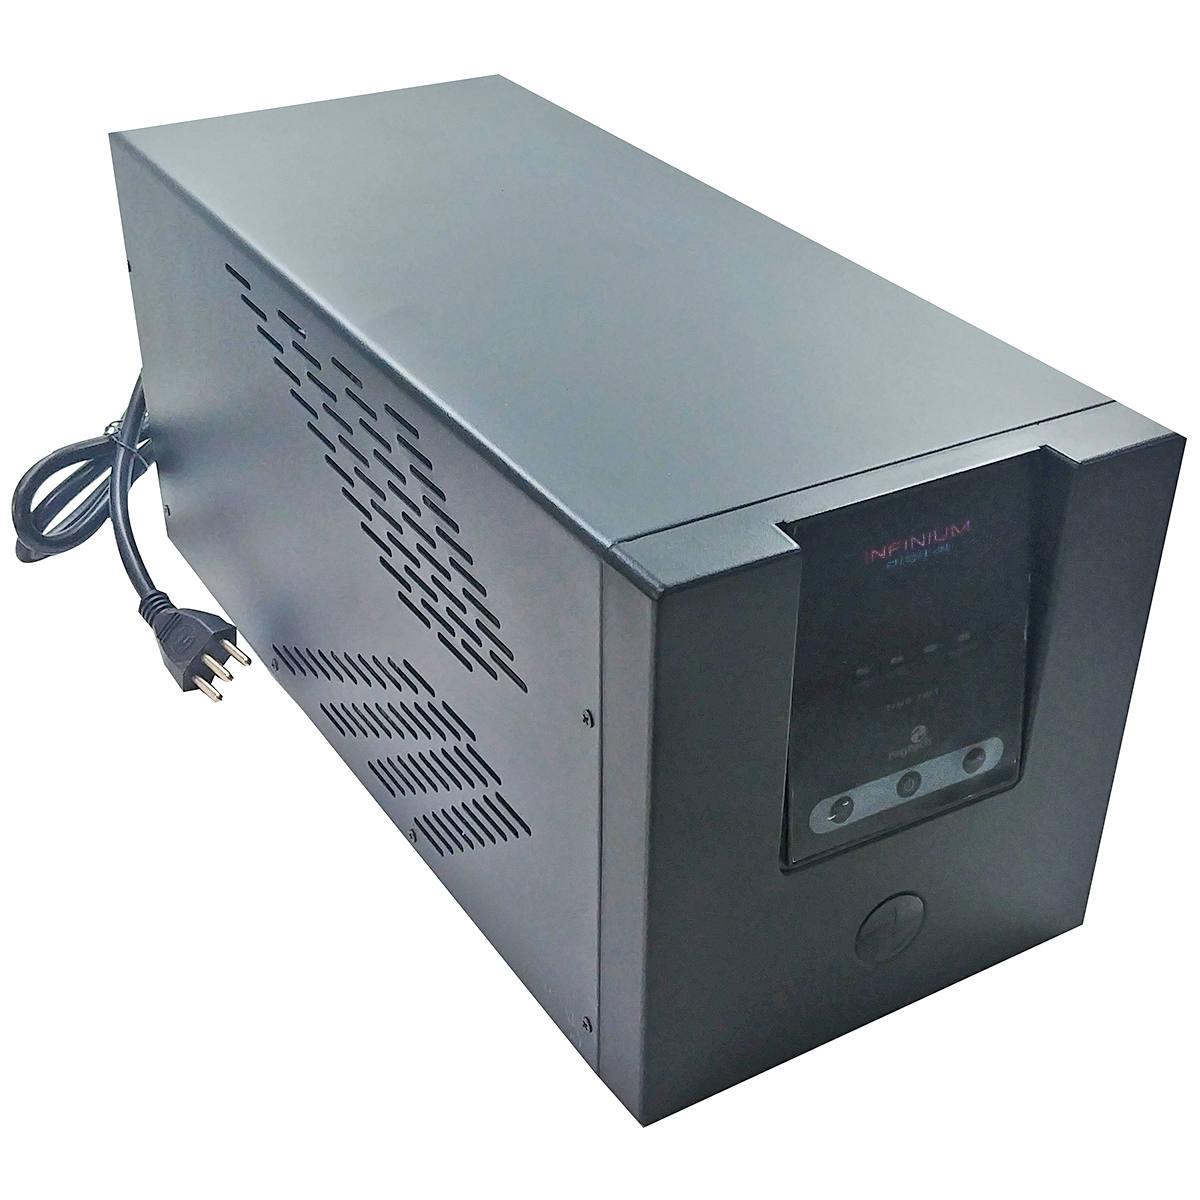 Nobreak 3200VA 2080W PWM Display Digital 10 Tomadas Conector Bateria Externa Disjuntor 30A Bivolt Ragtech Infinium 3902